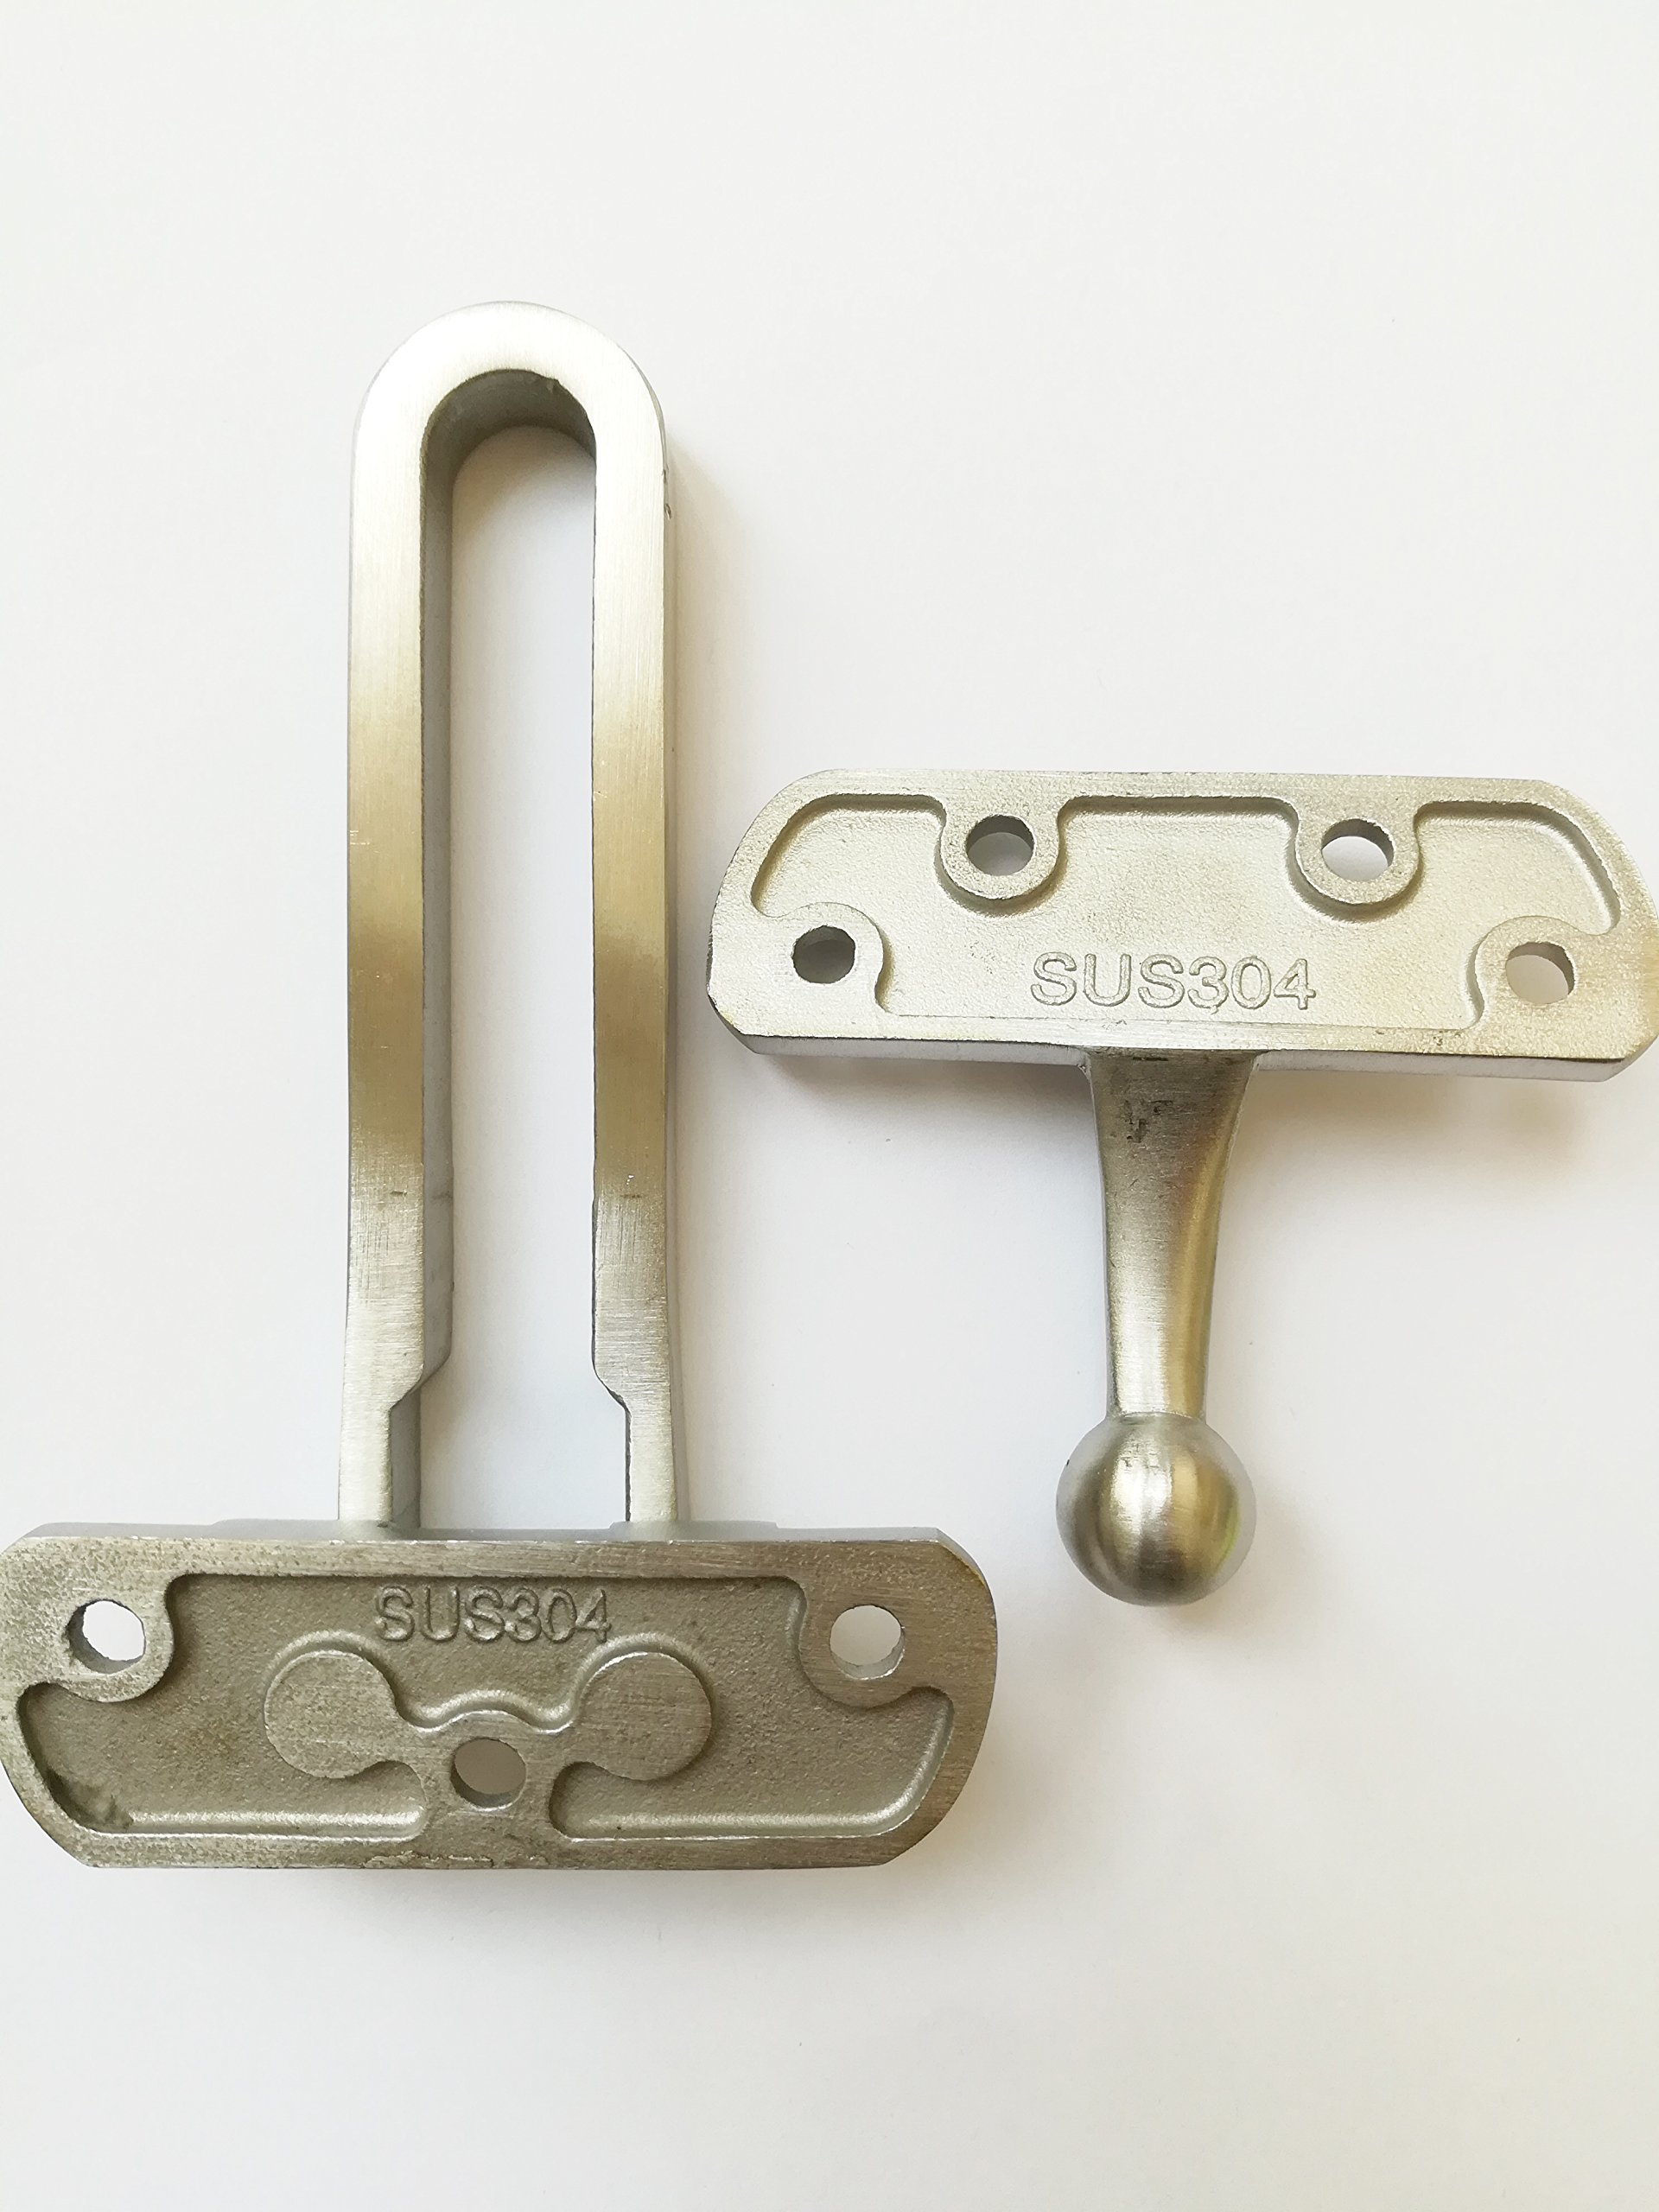 TOGU Solid Die-casted Sus 304 Stainless Steel Thicken Security Door Guard,Gate Latches Swing Bar Door Guard,Burglar-Proof Padlock Door Clasp For Home,Apartment,Hotel,Motel,Dormitory,Satin Nickel